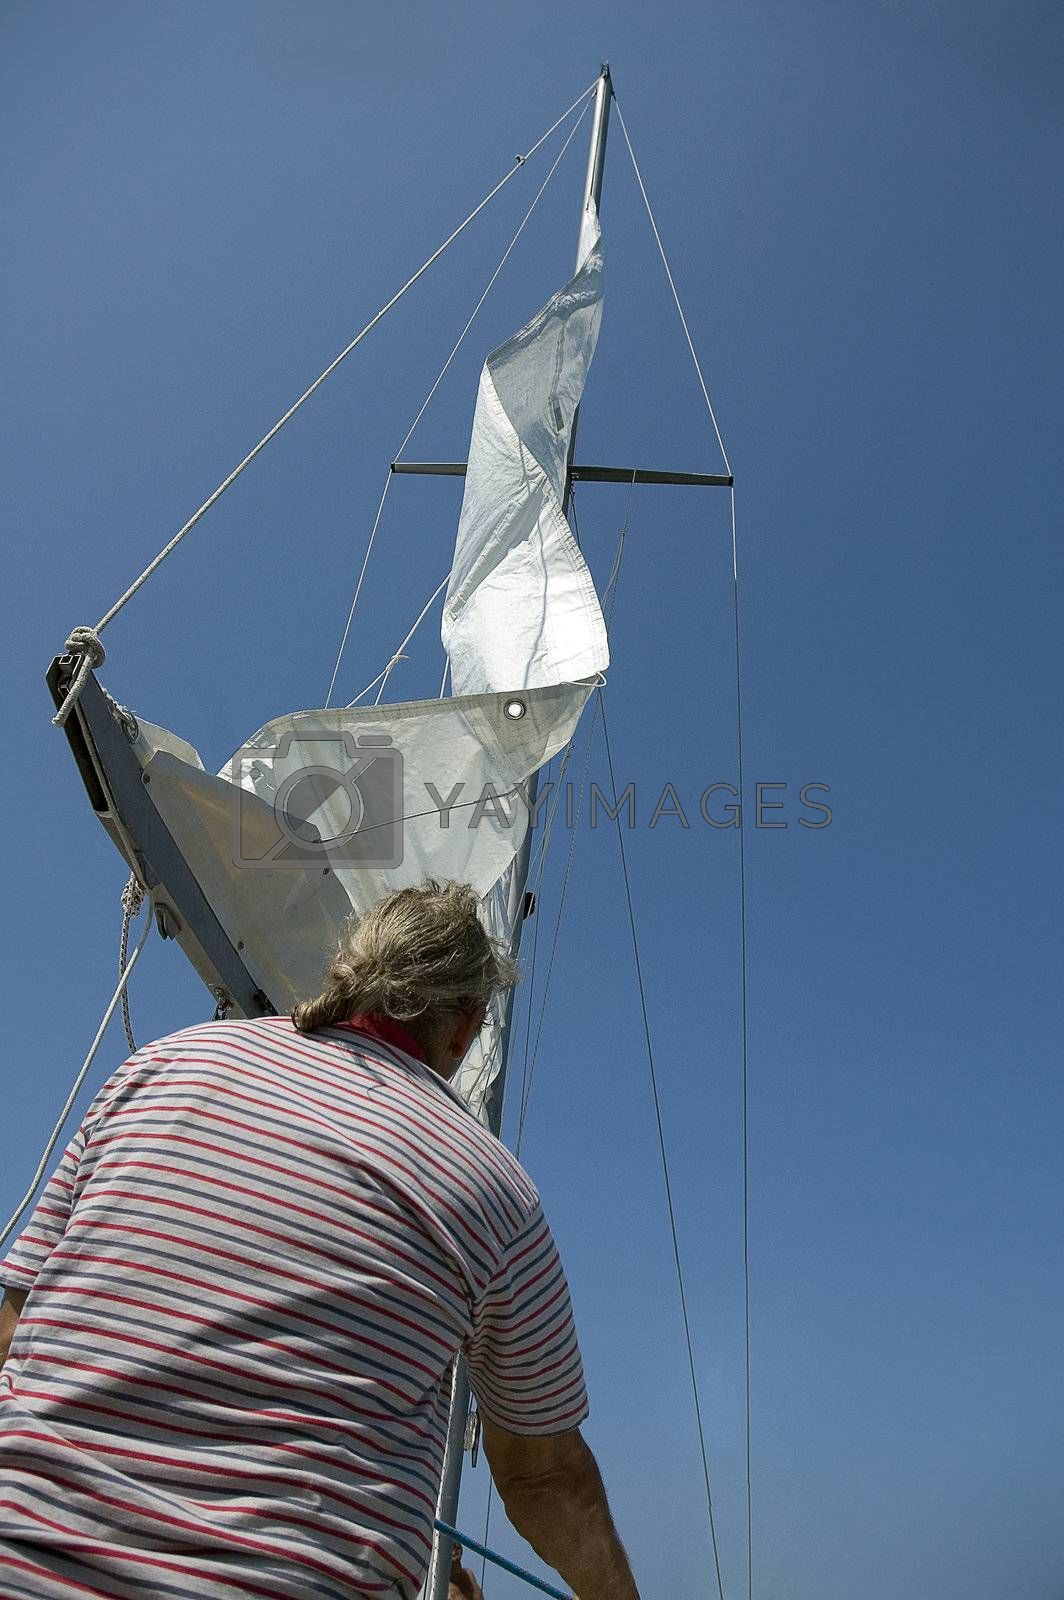 skypper that raises its sails